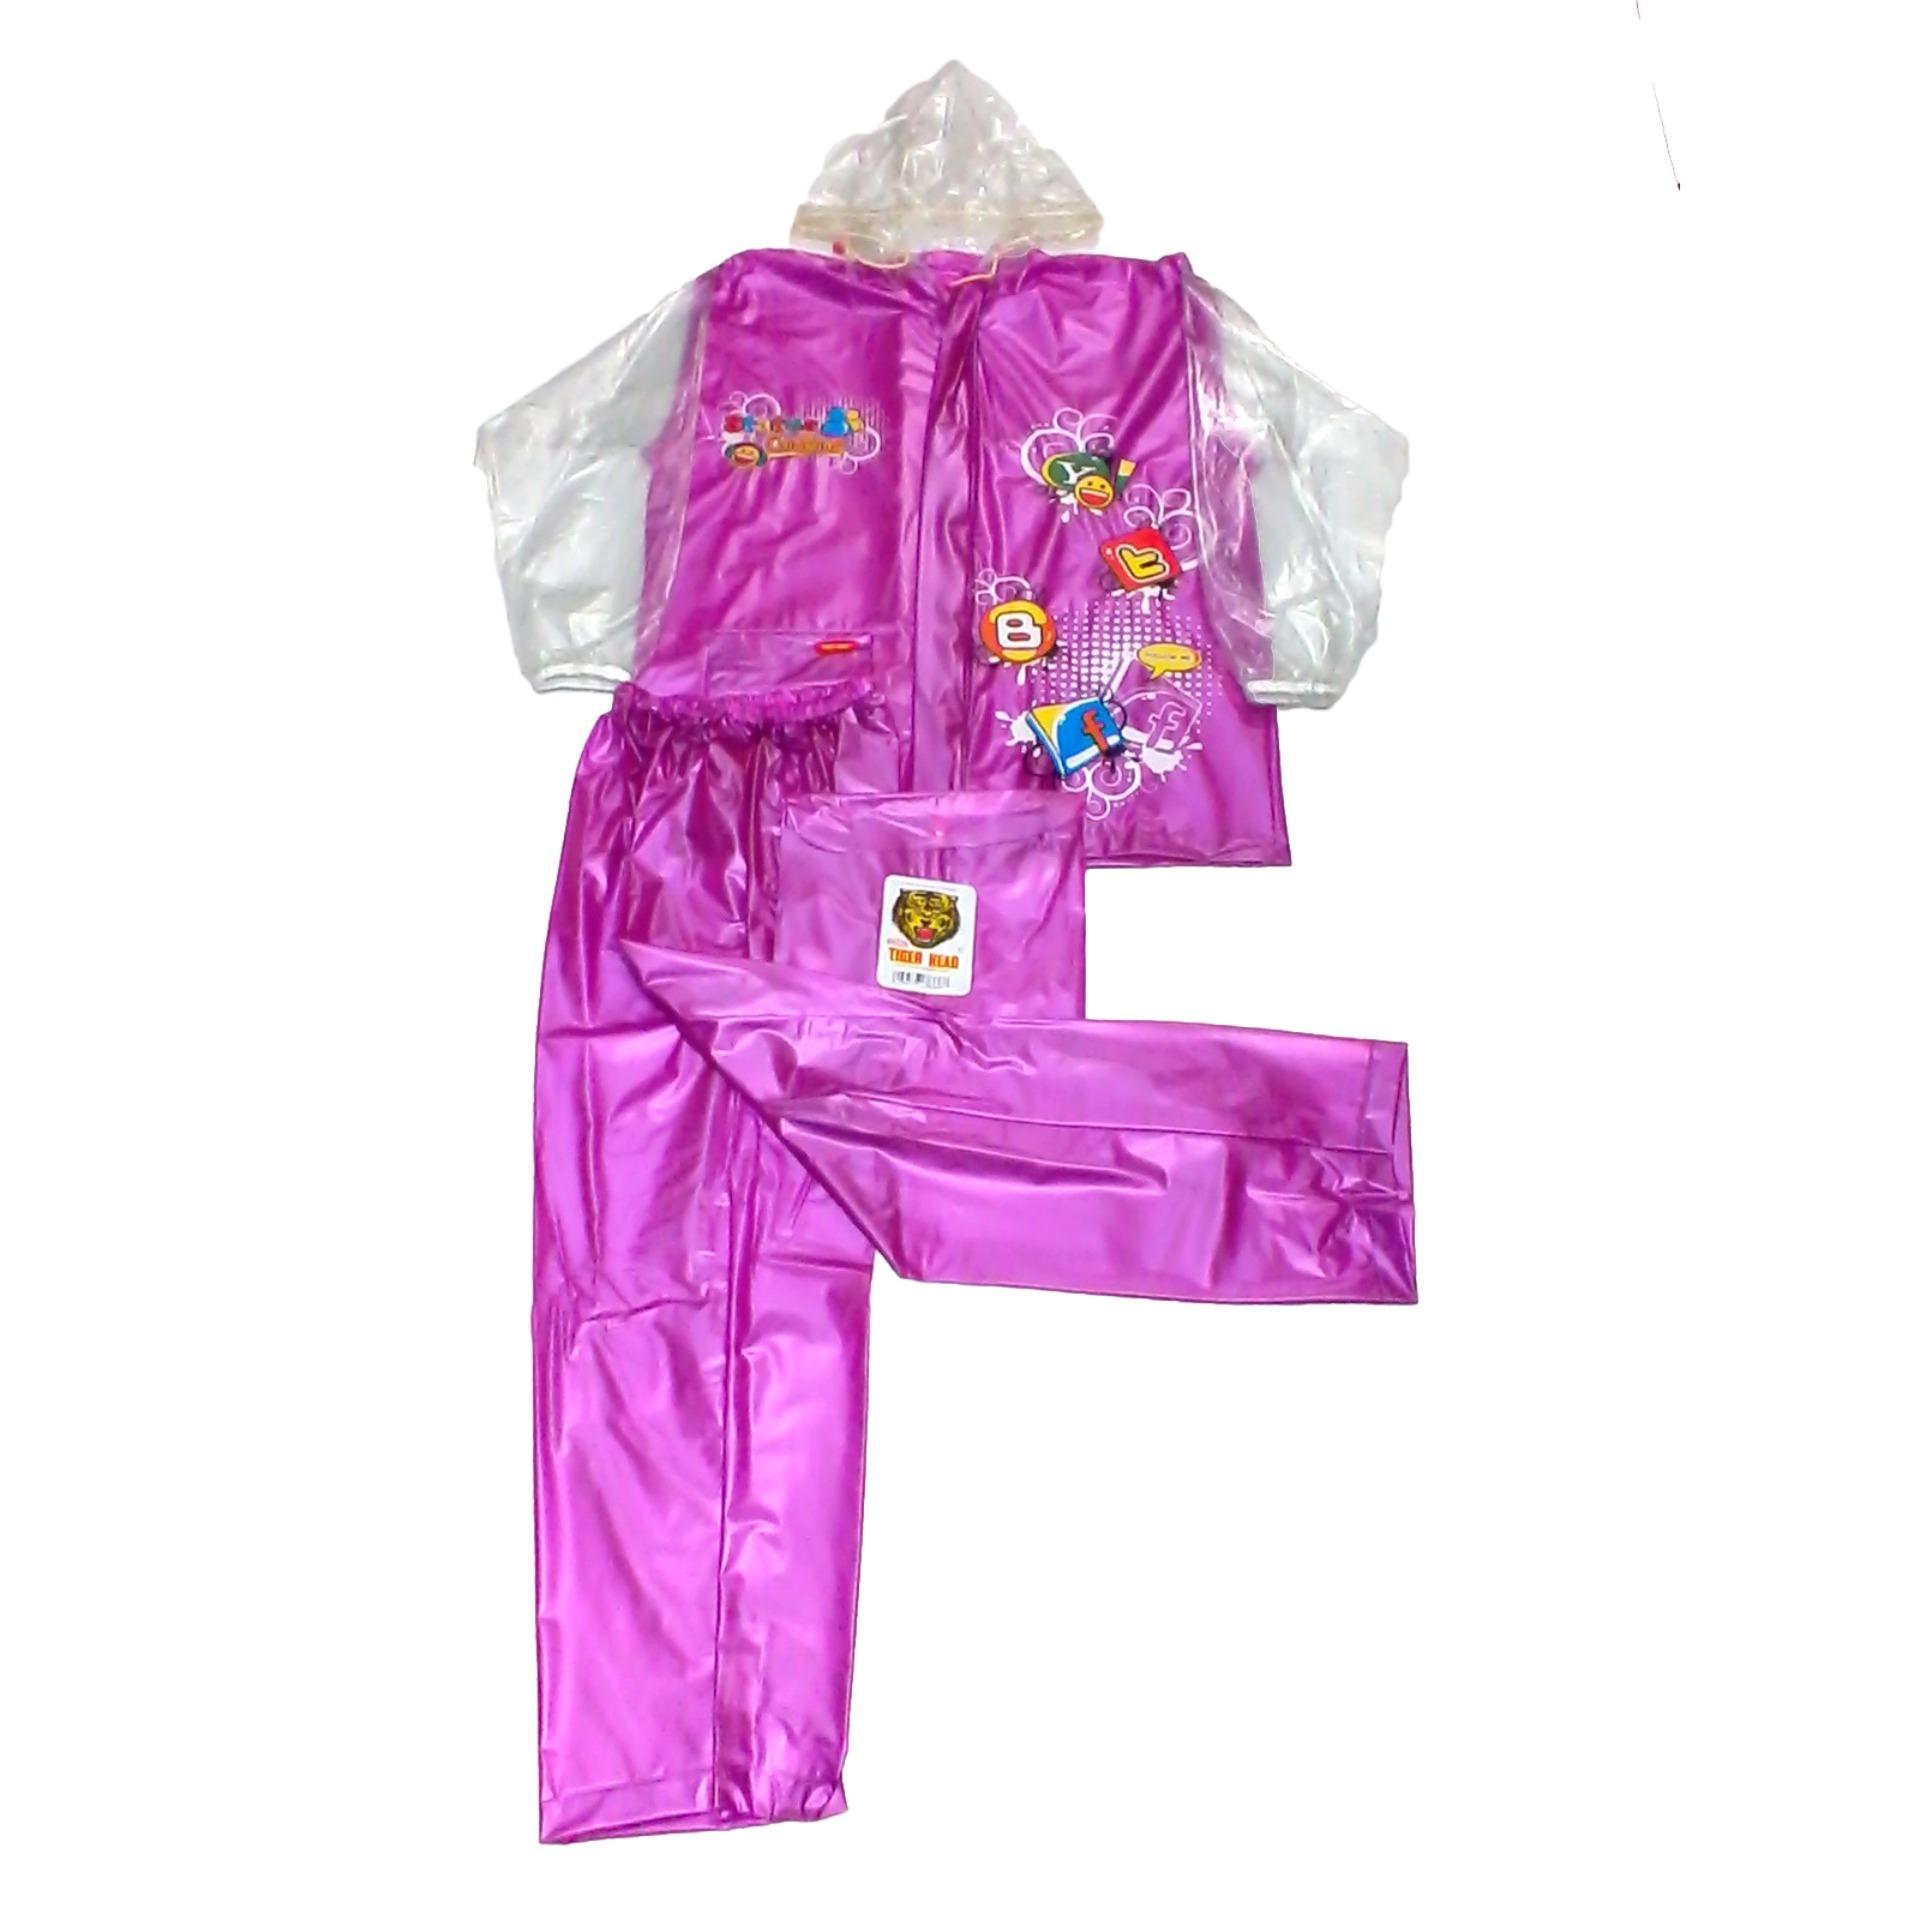 Tiger Head Jas Hujan Setelan Olympic Remaja - Raincoat Jaket Celana Pria Wanita Murah - Ungu